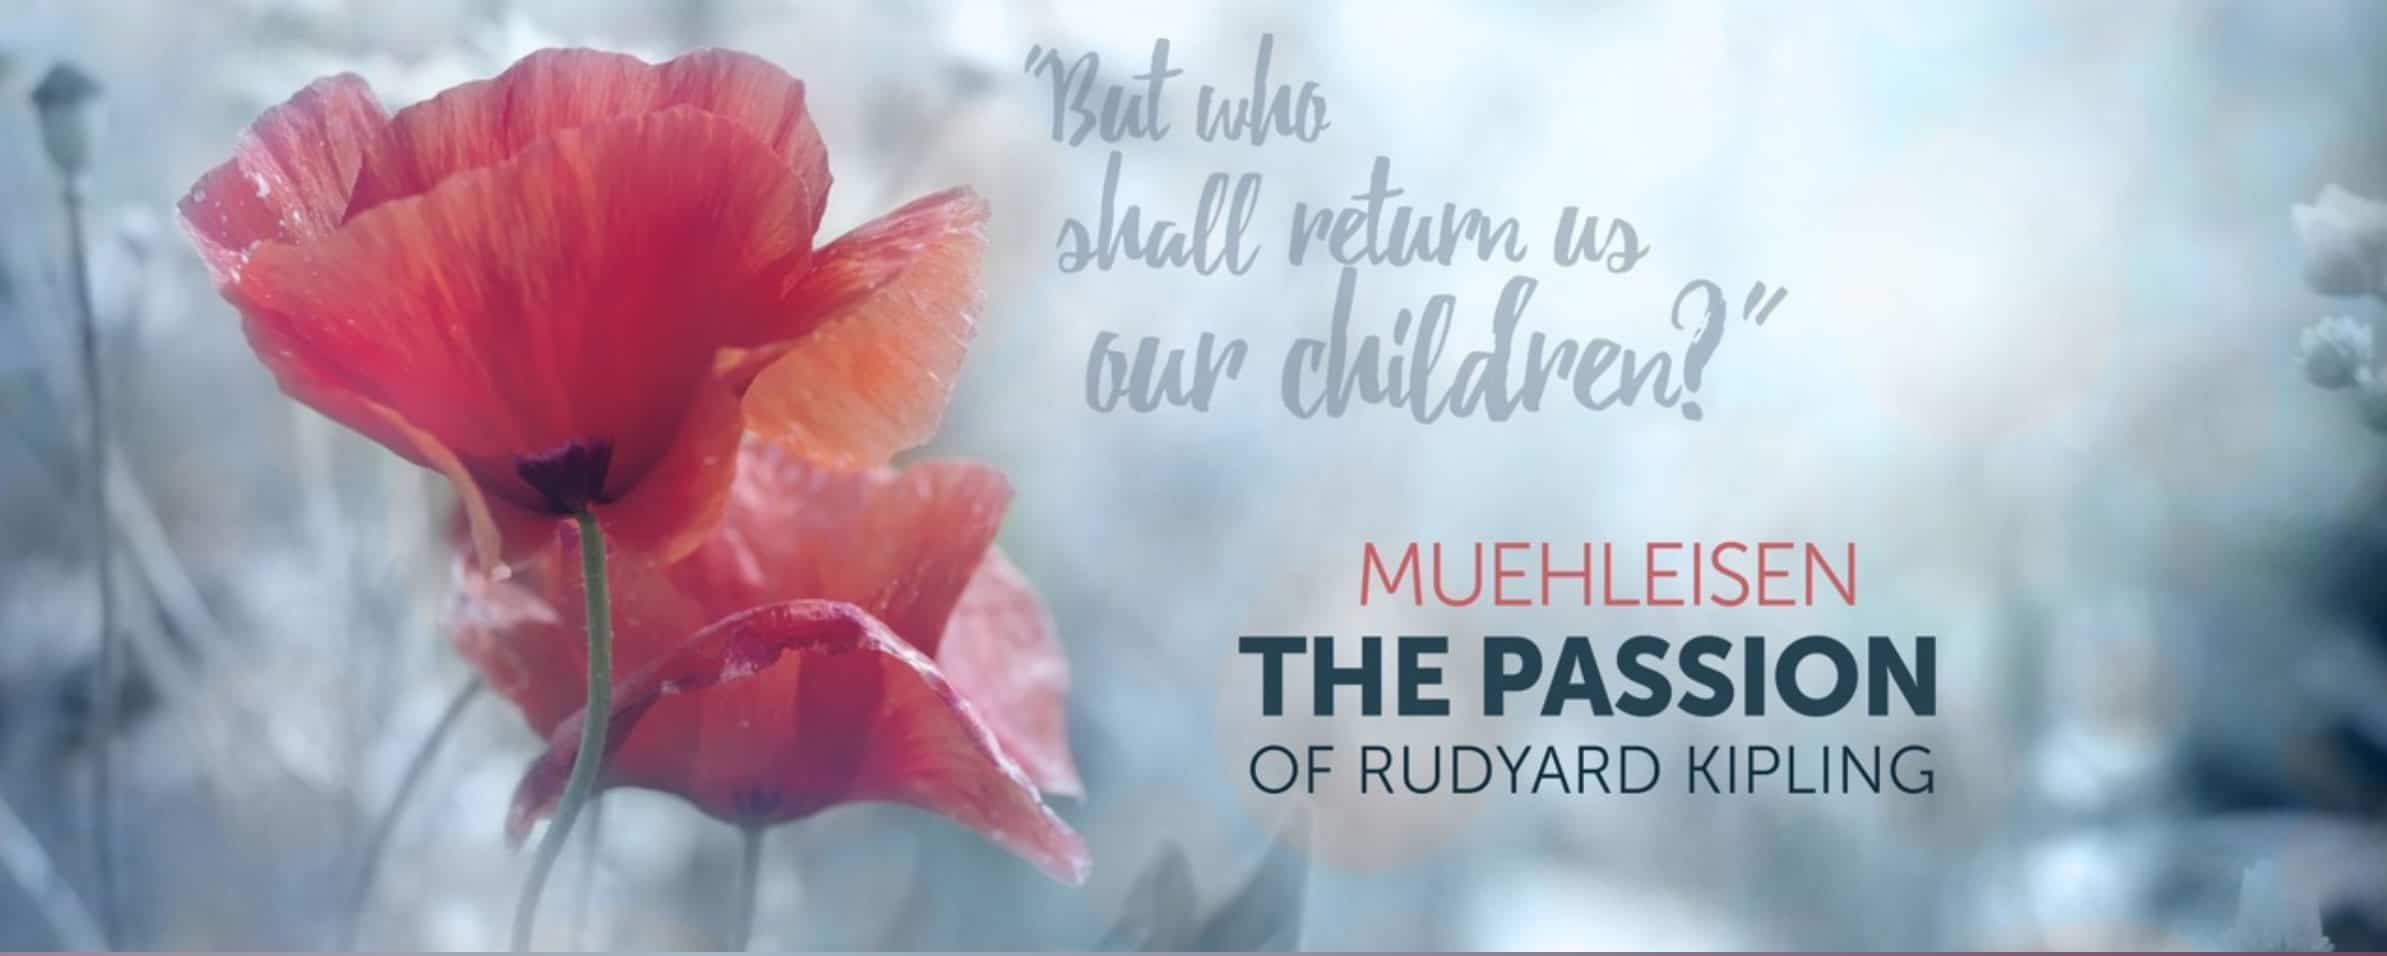 The Passion of Rudyard Kipling